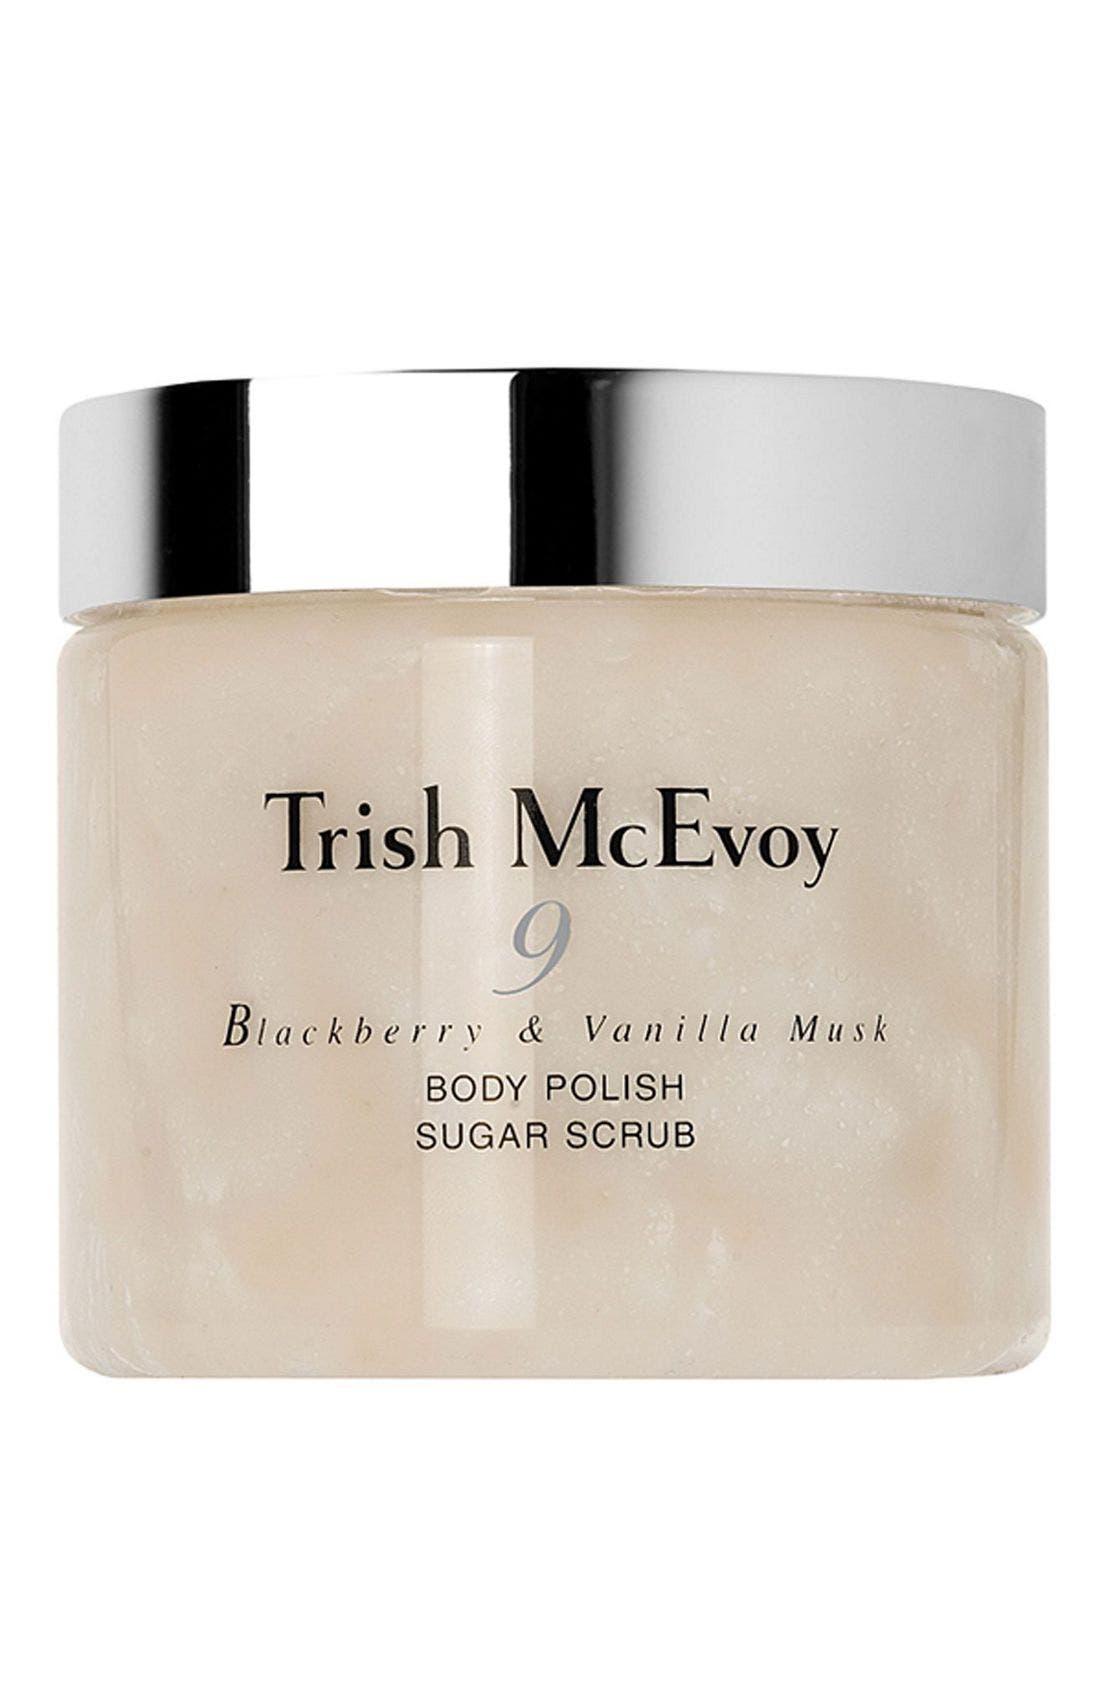 Trish McEvoy 'No. 9 Blackberry & Vanilla Musk' Body Polish Sugar Scrub